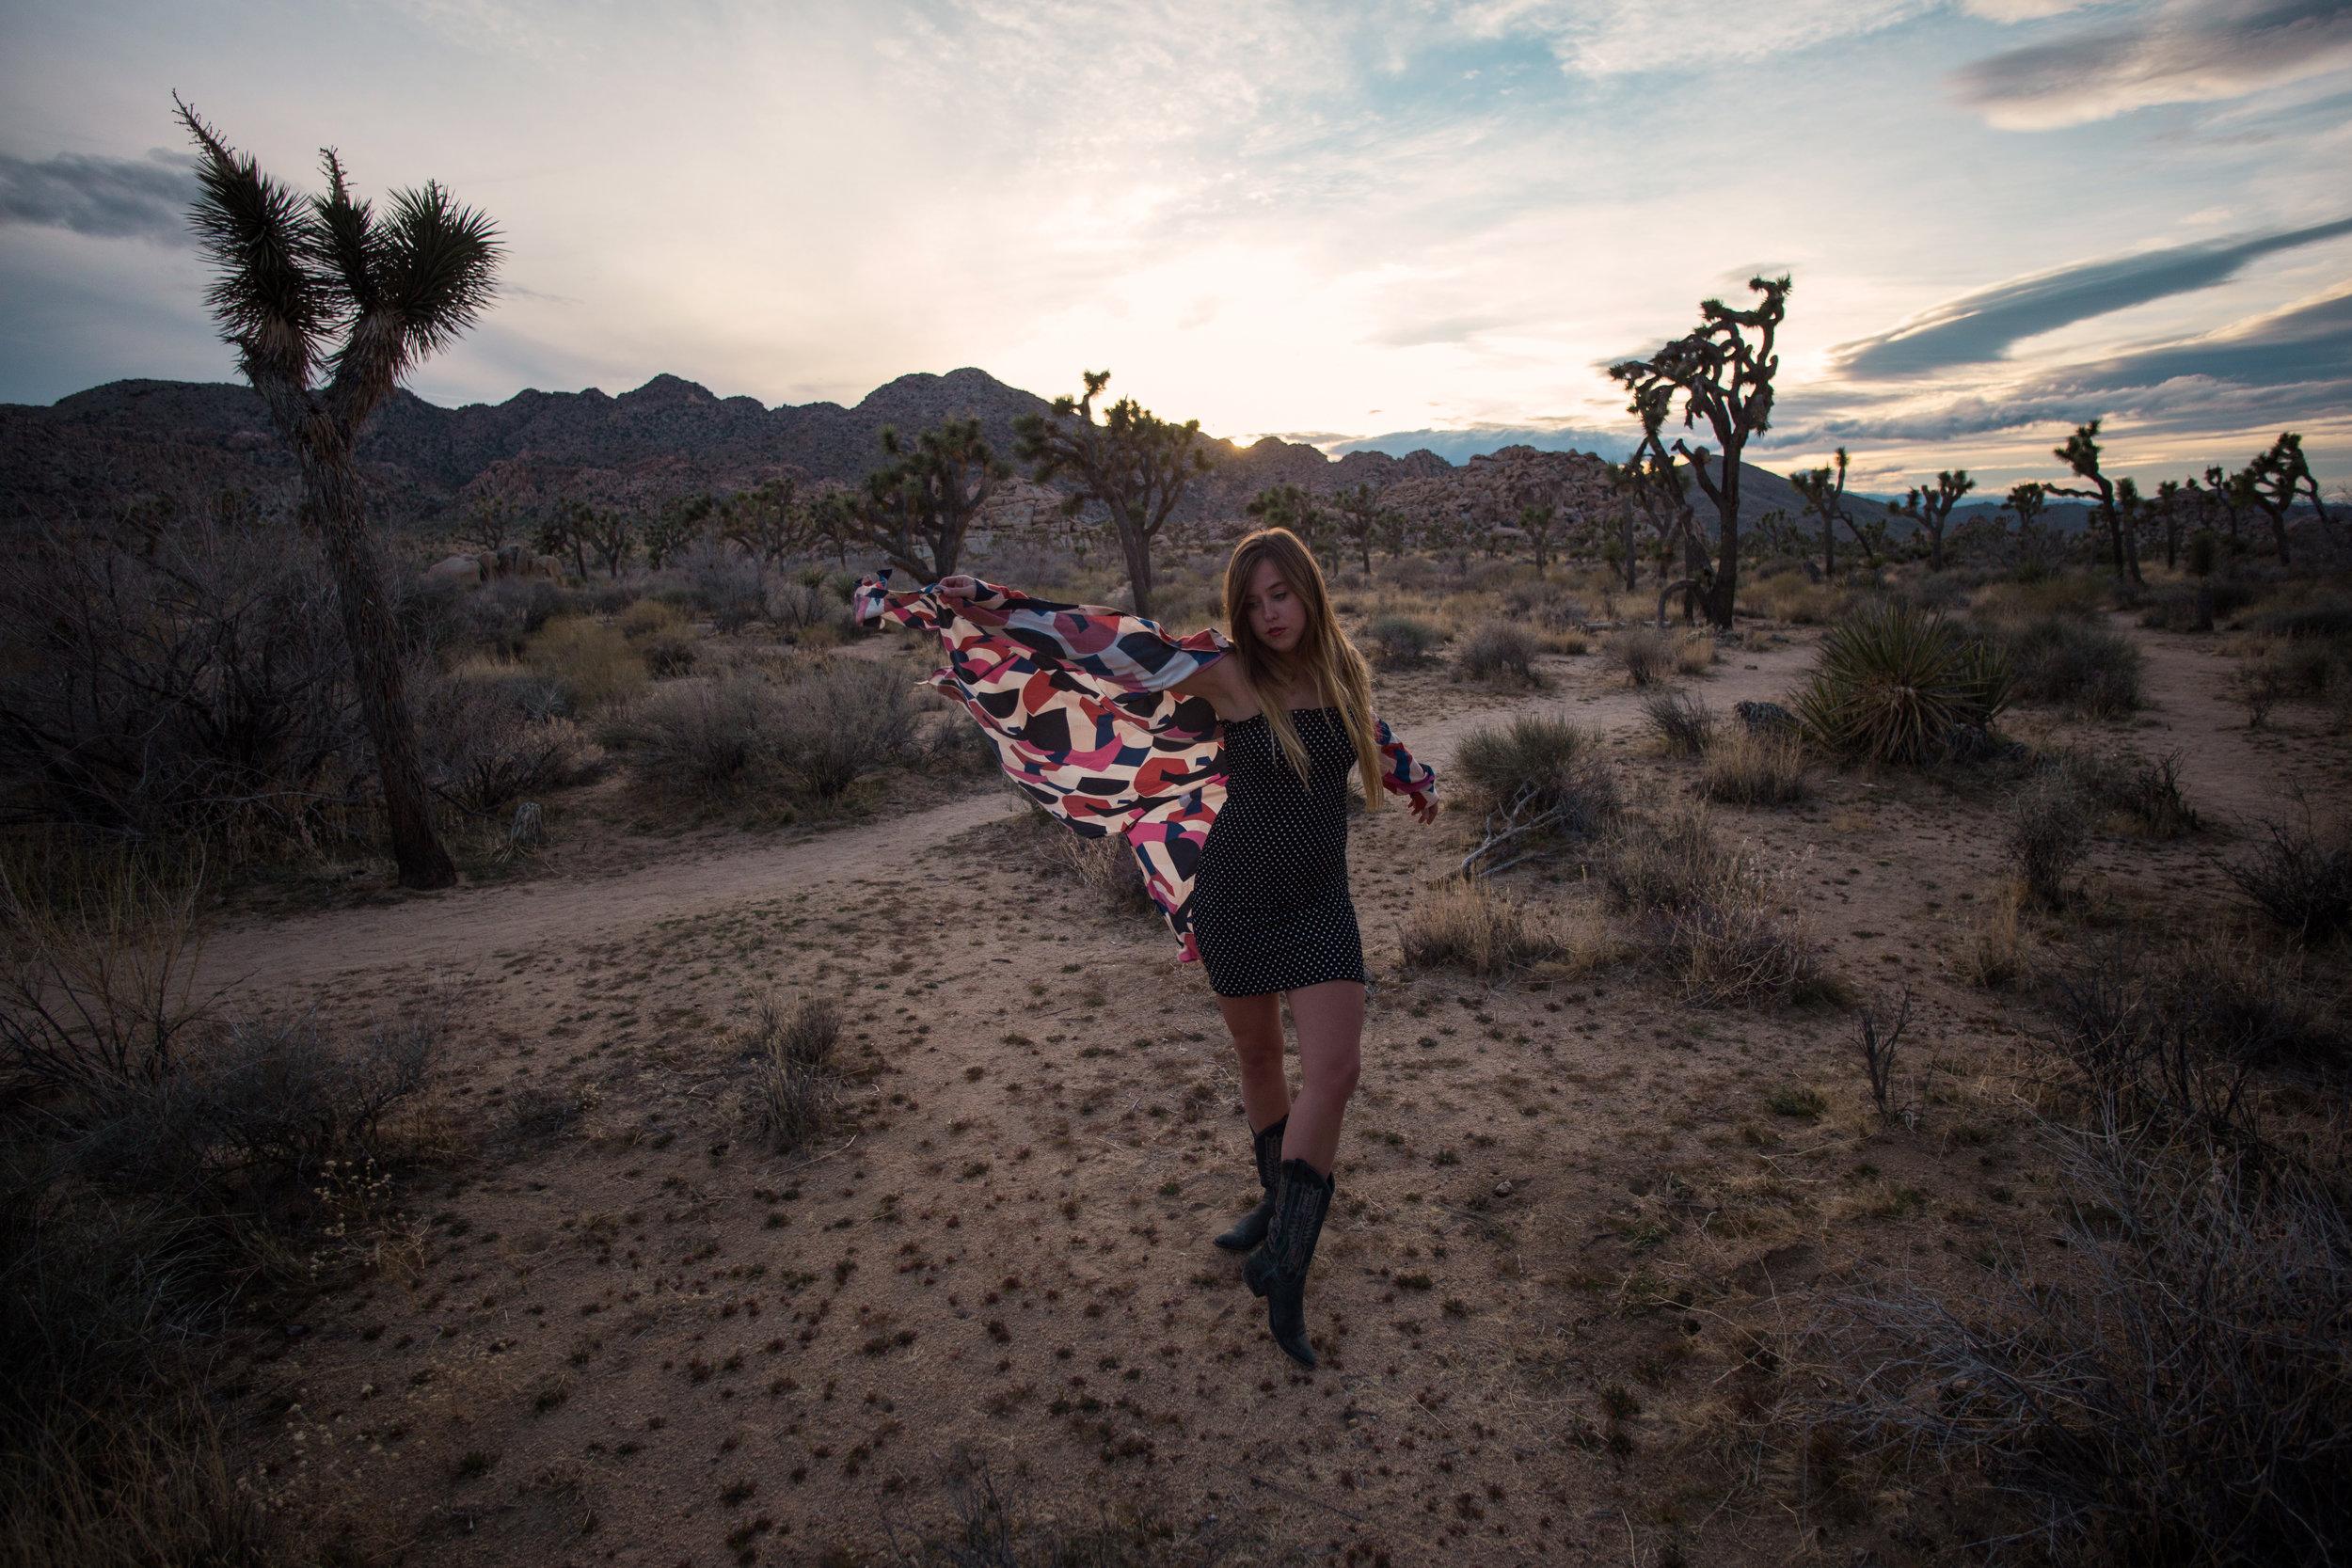 AstroBandit_JordanRose_GoJane_FreePeople_CowboyBoots_FarylRobin_Desert_Sunset_Spring_2018_MixingPrints_9.jpg